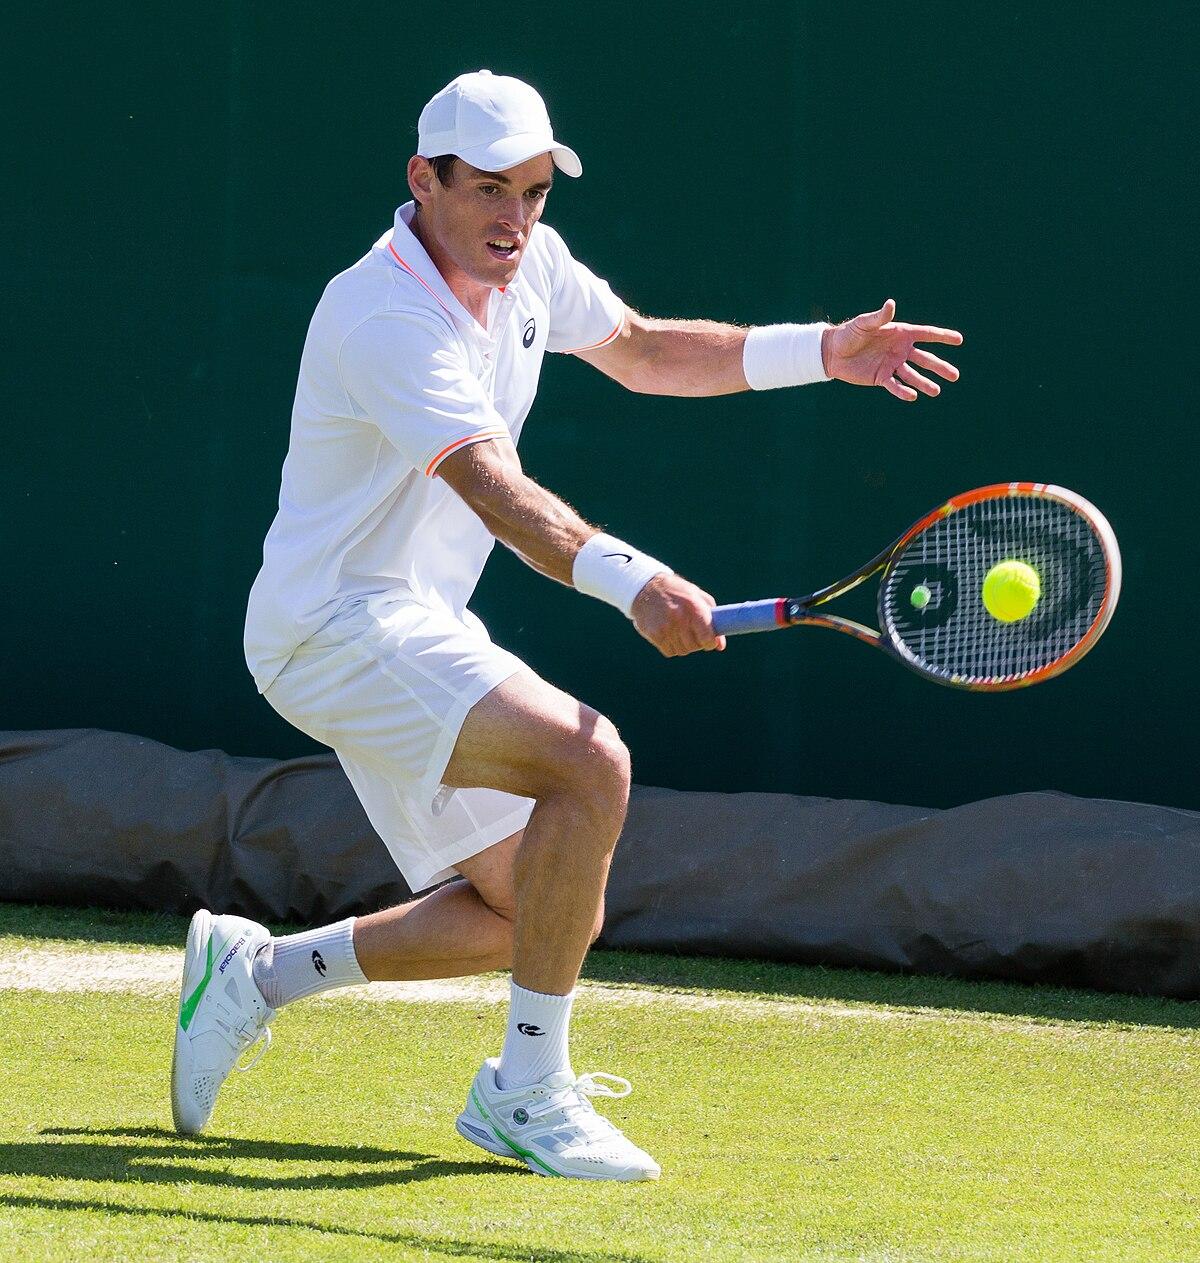 James McGee (tennis) - Wikipedia